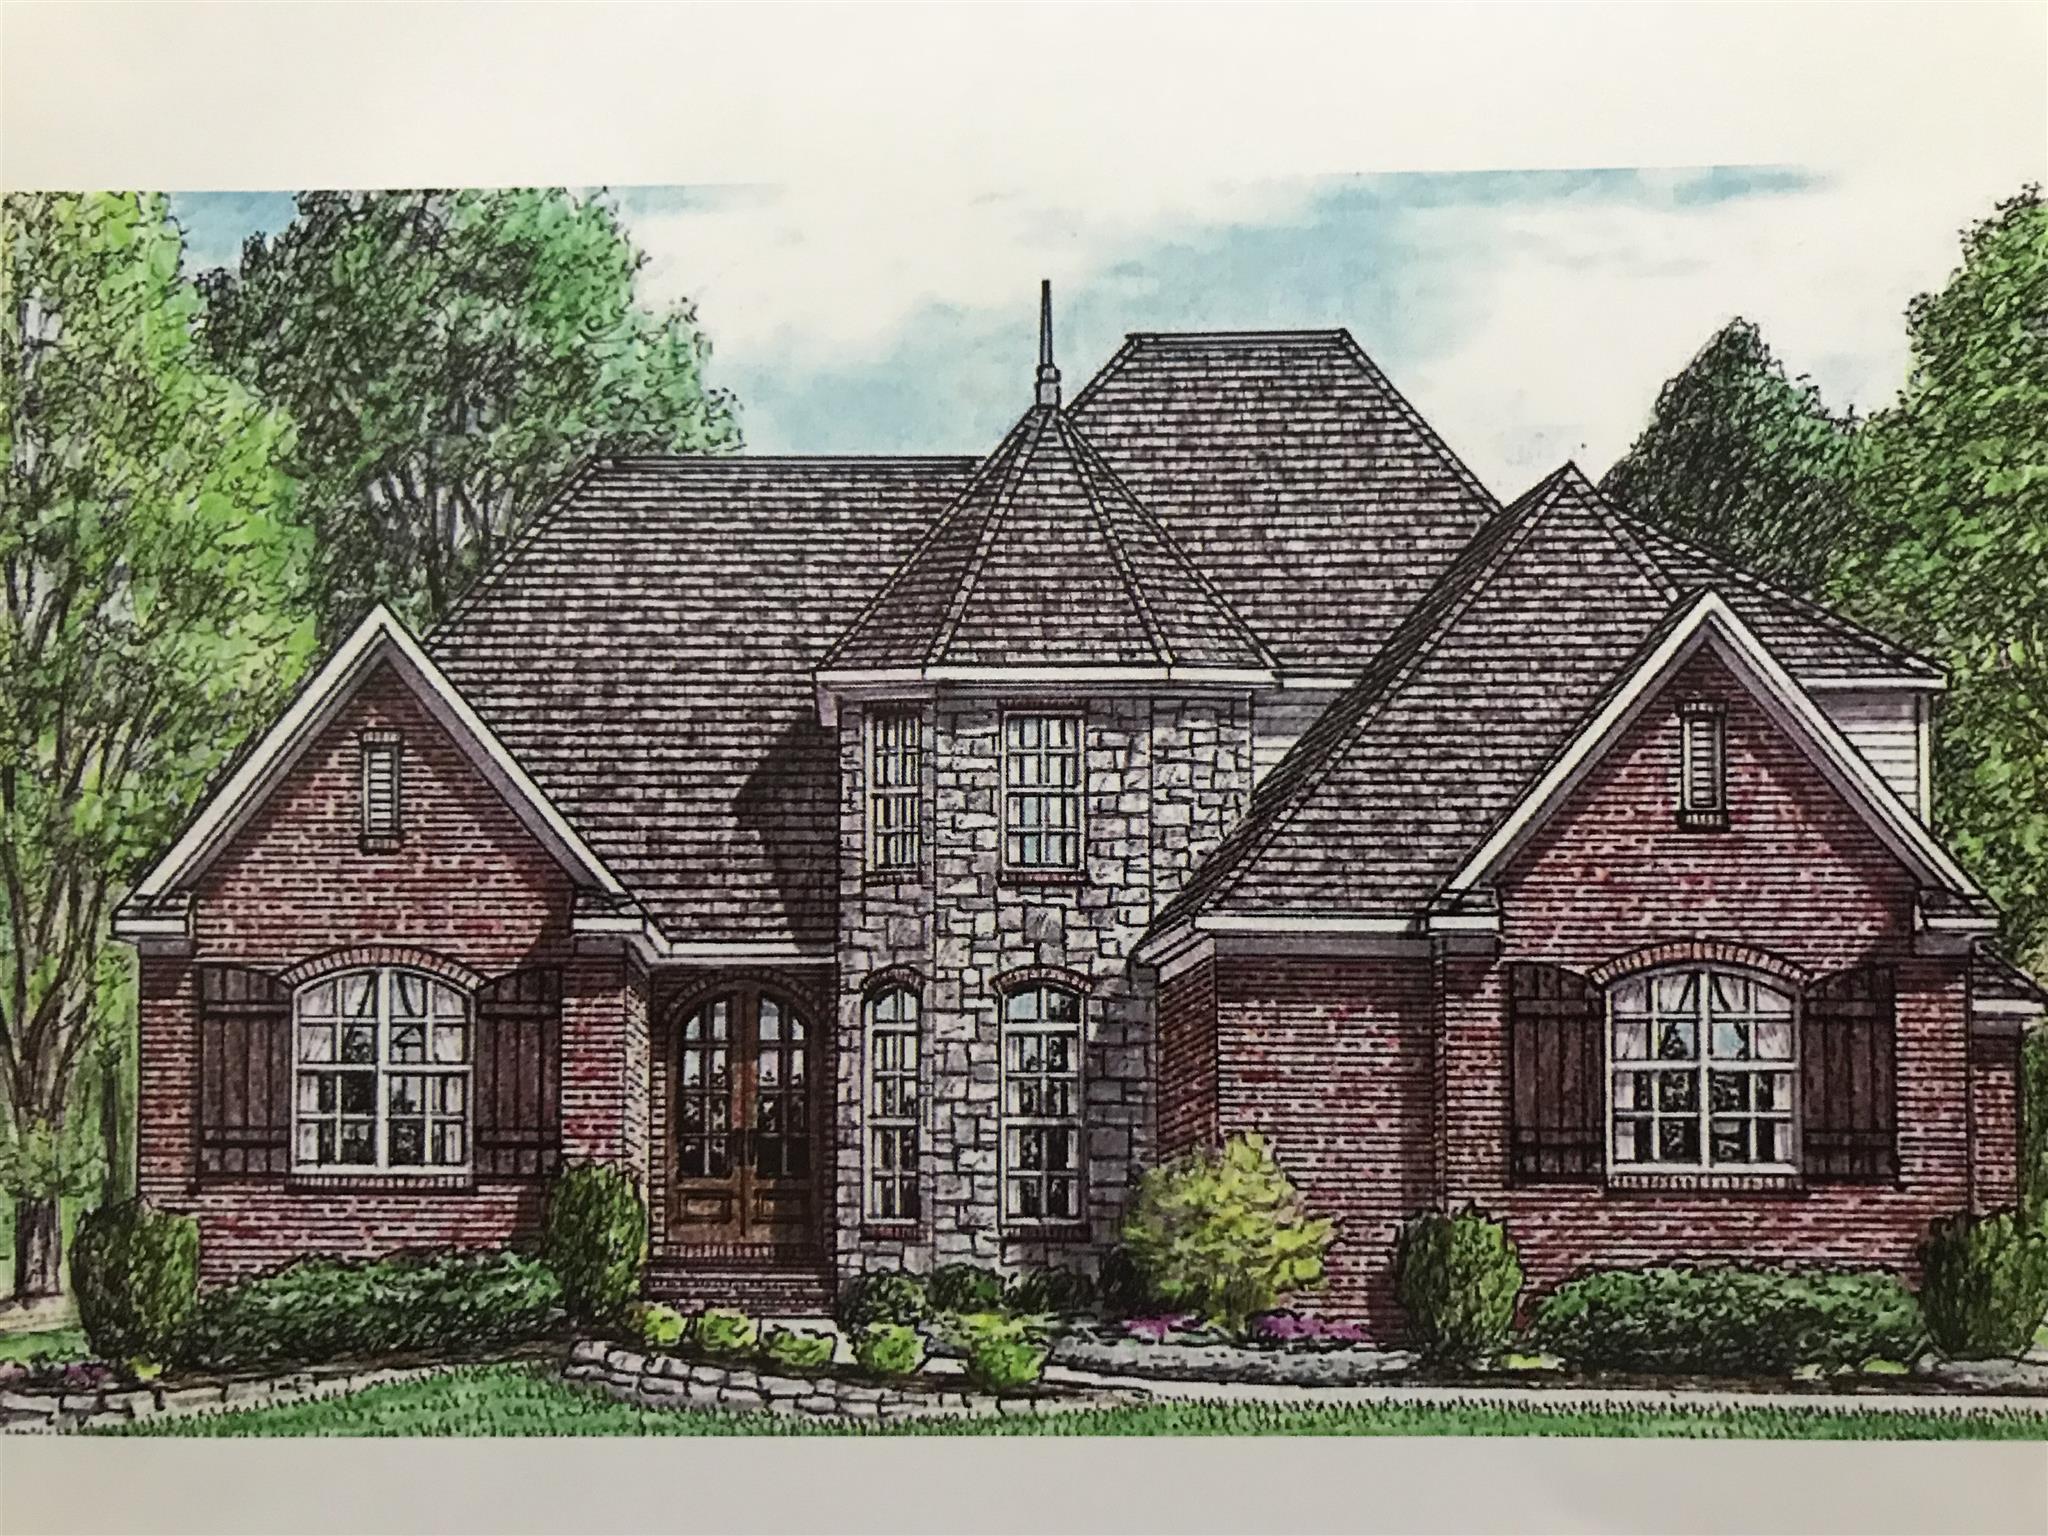 2023 Eagle View Rd, Hendersonville, TN 37075 - Hendersonville, TN real estate listing